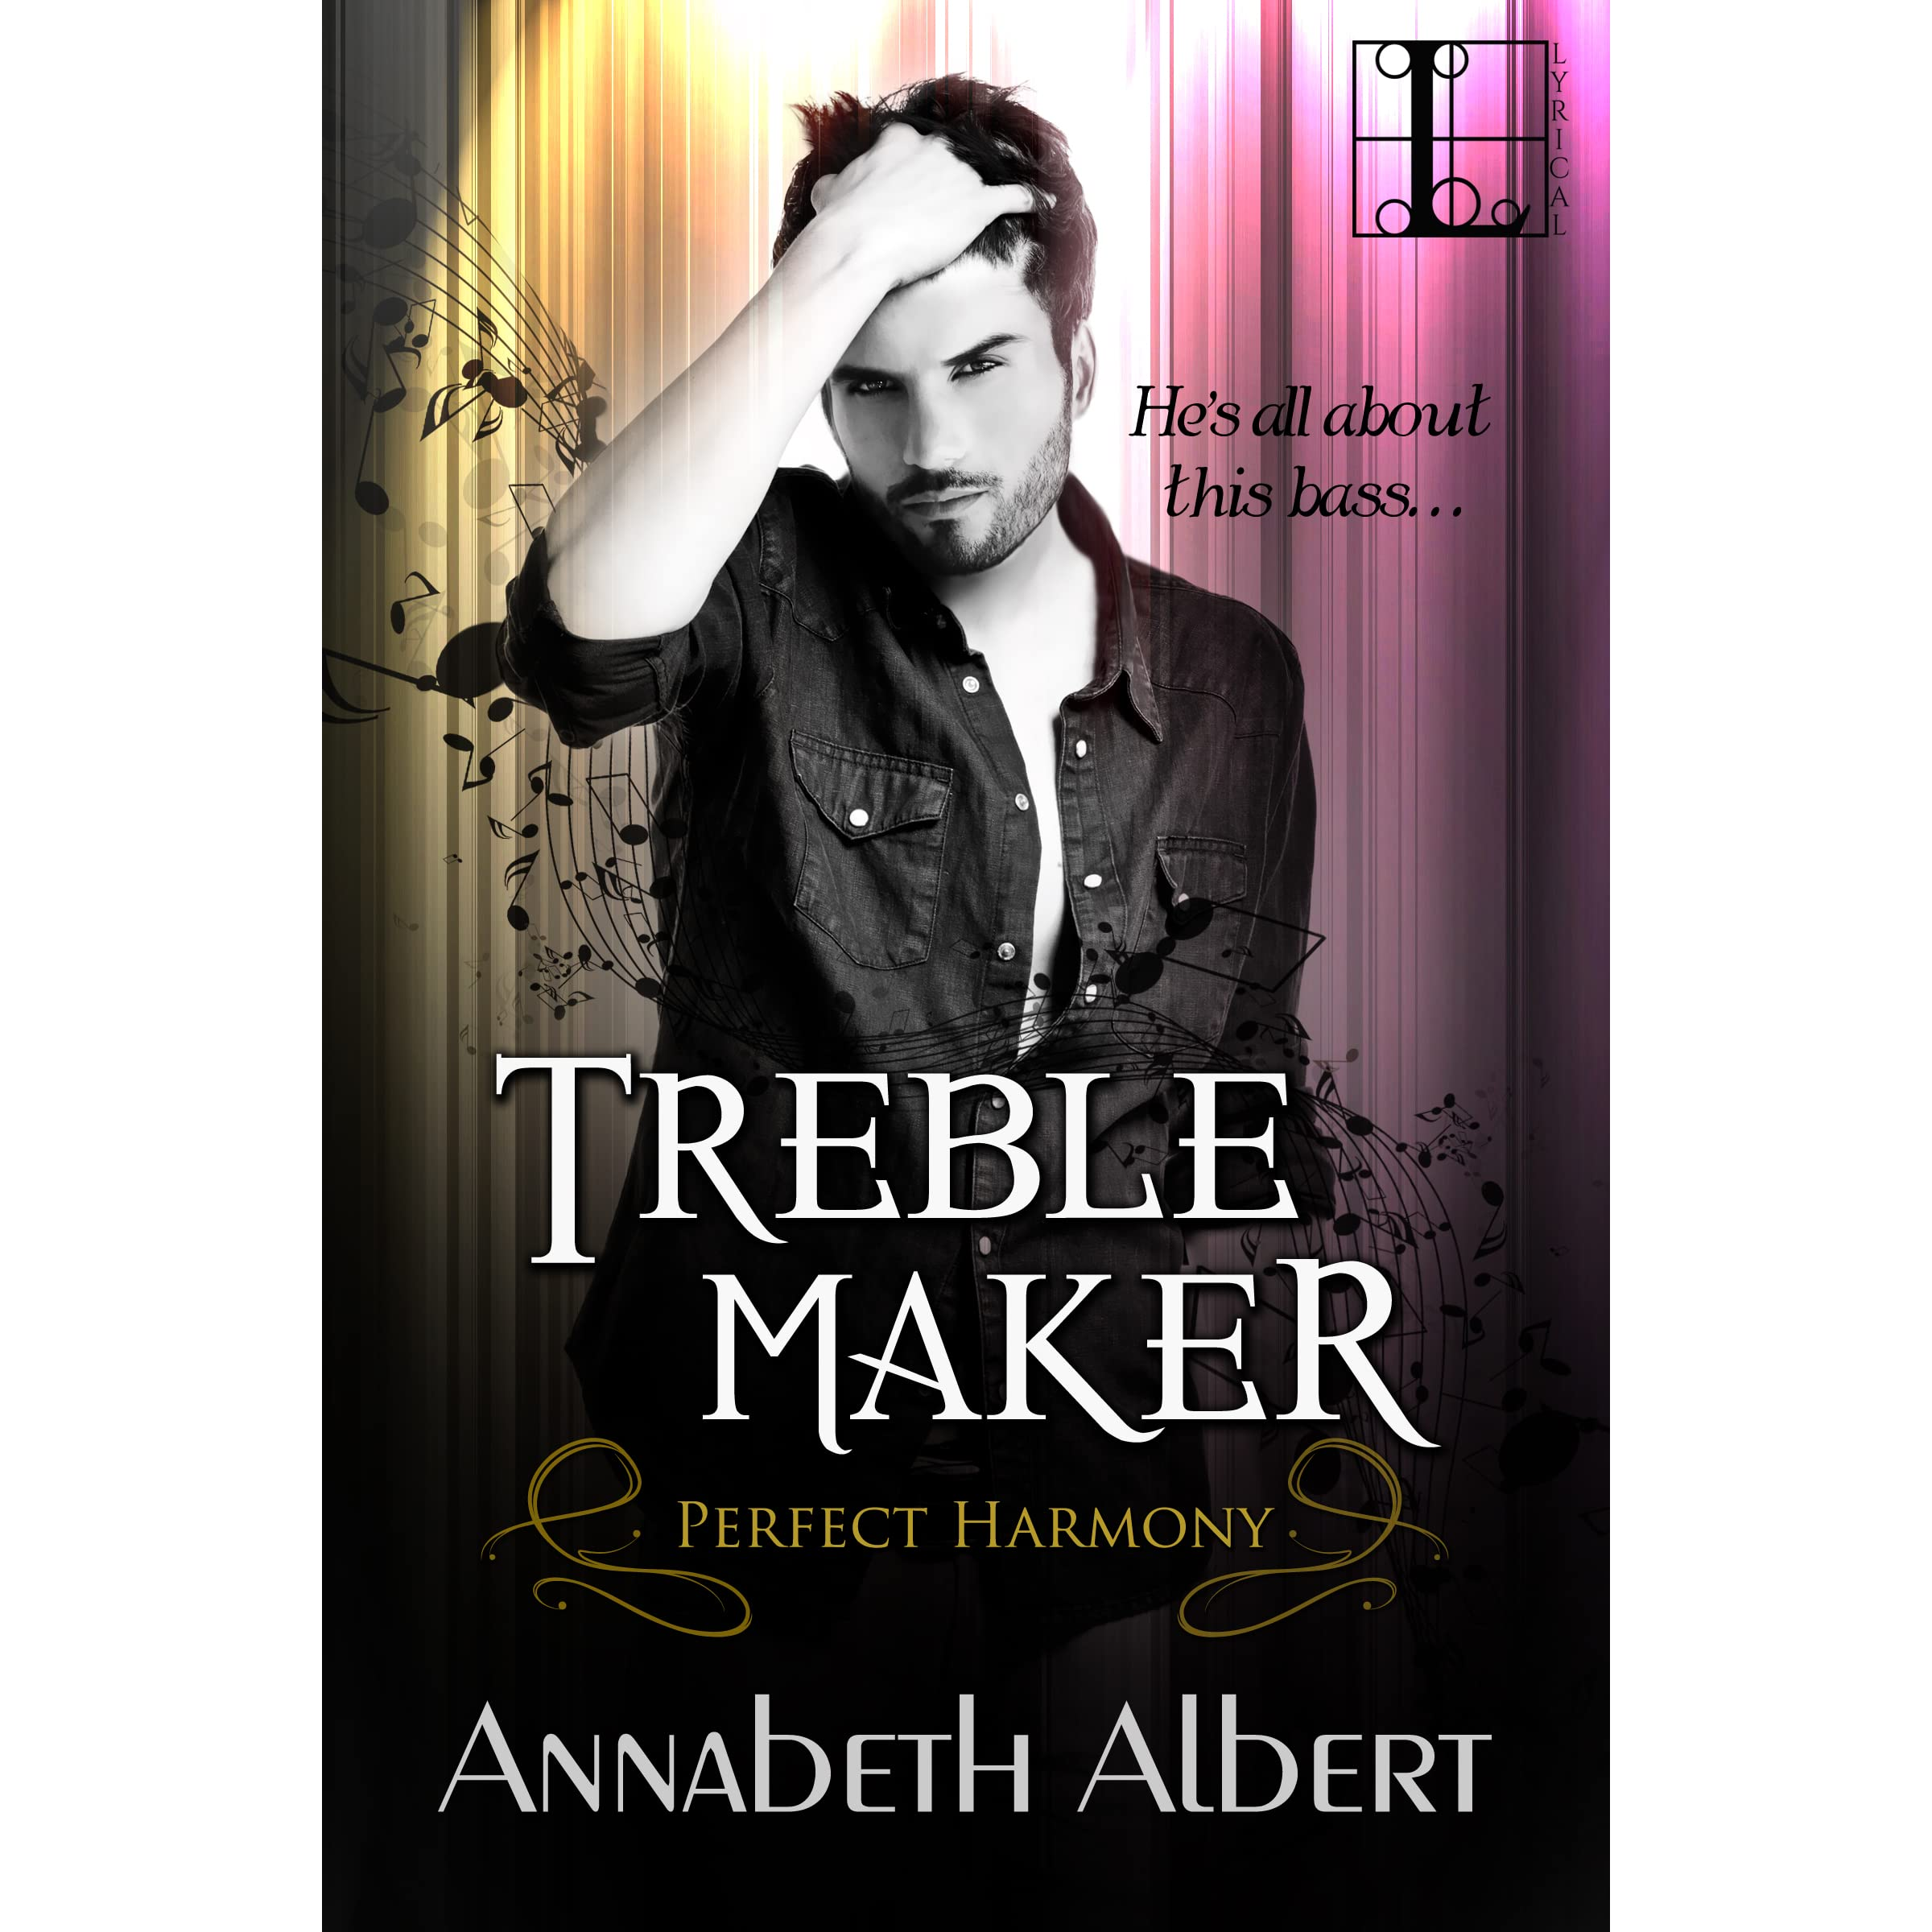 treble maker perfect harmony 1 by annabeth albert